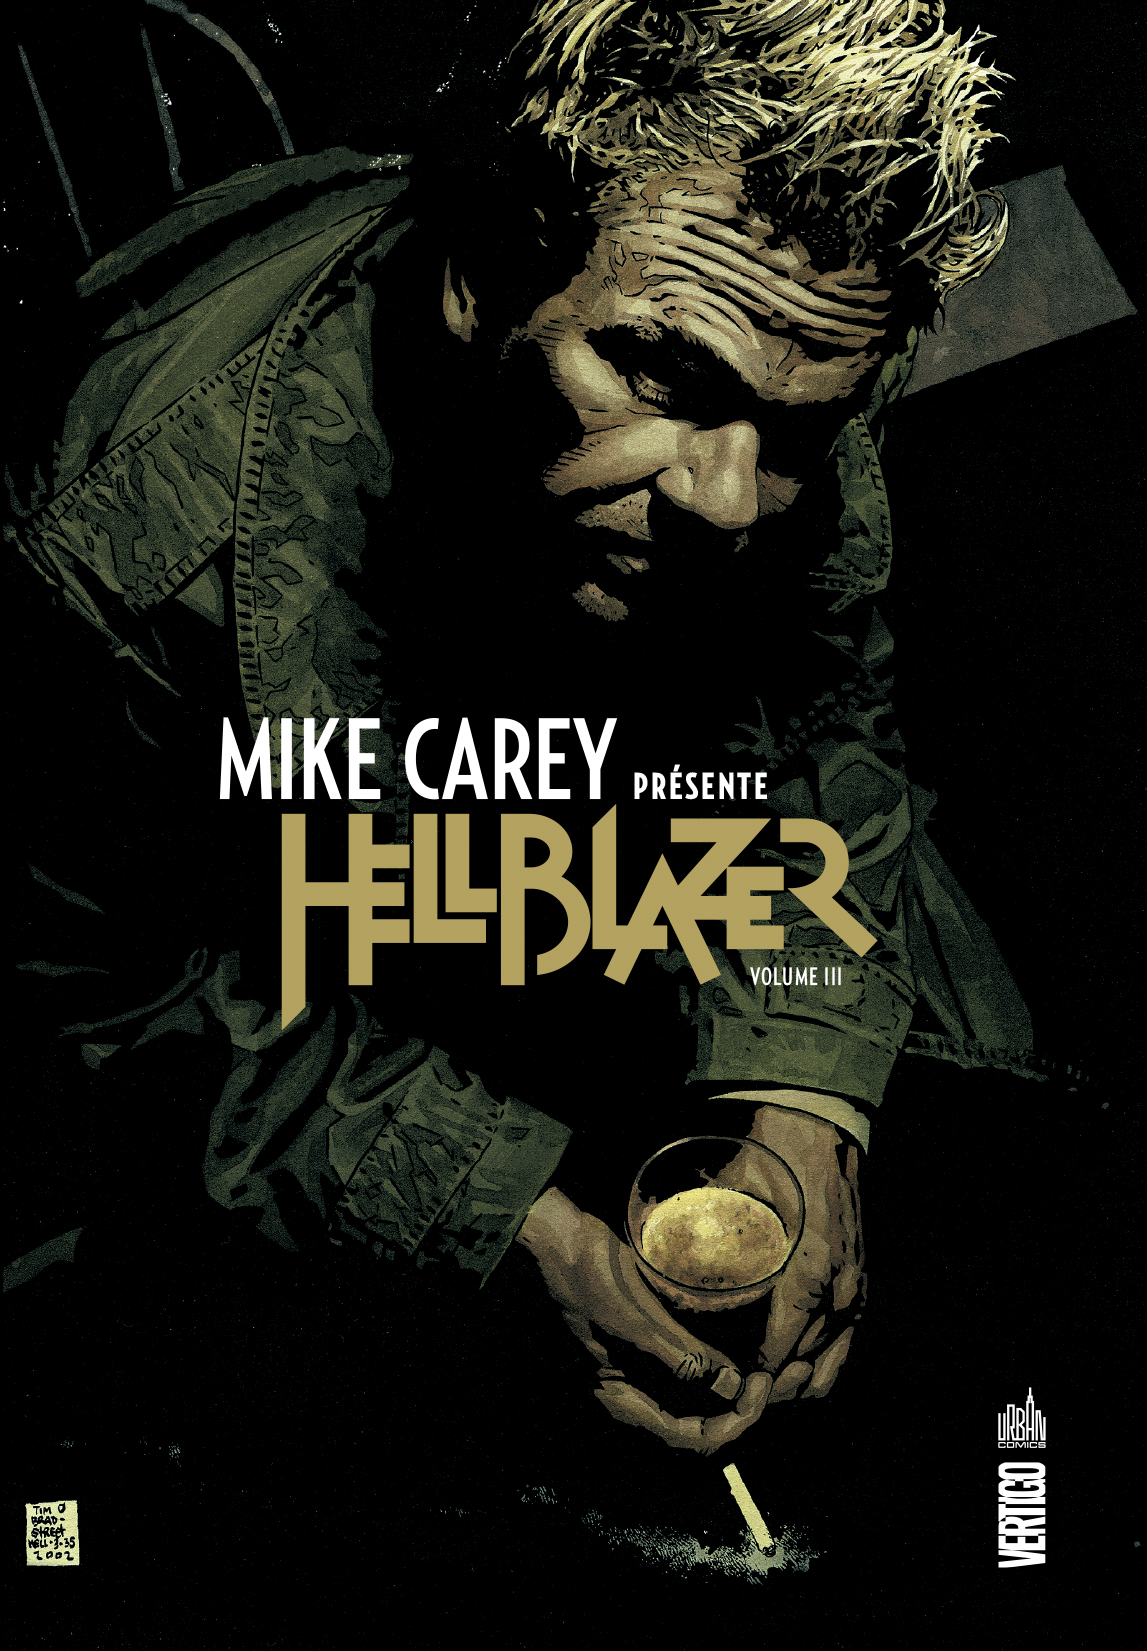 Mike Carey Présente Hellblazer 3